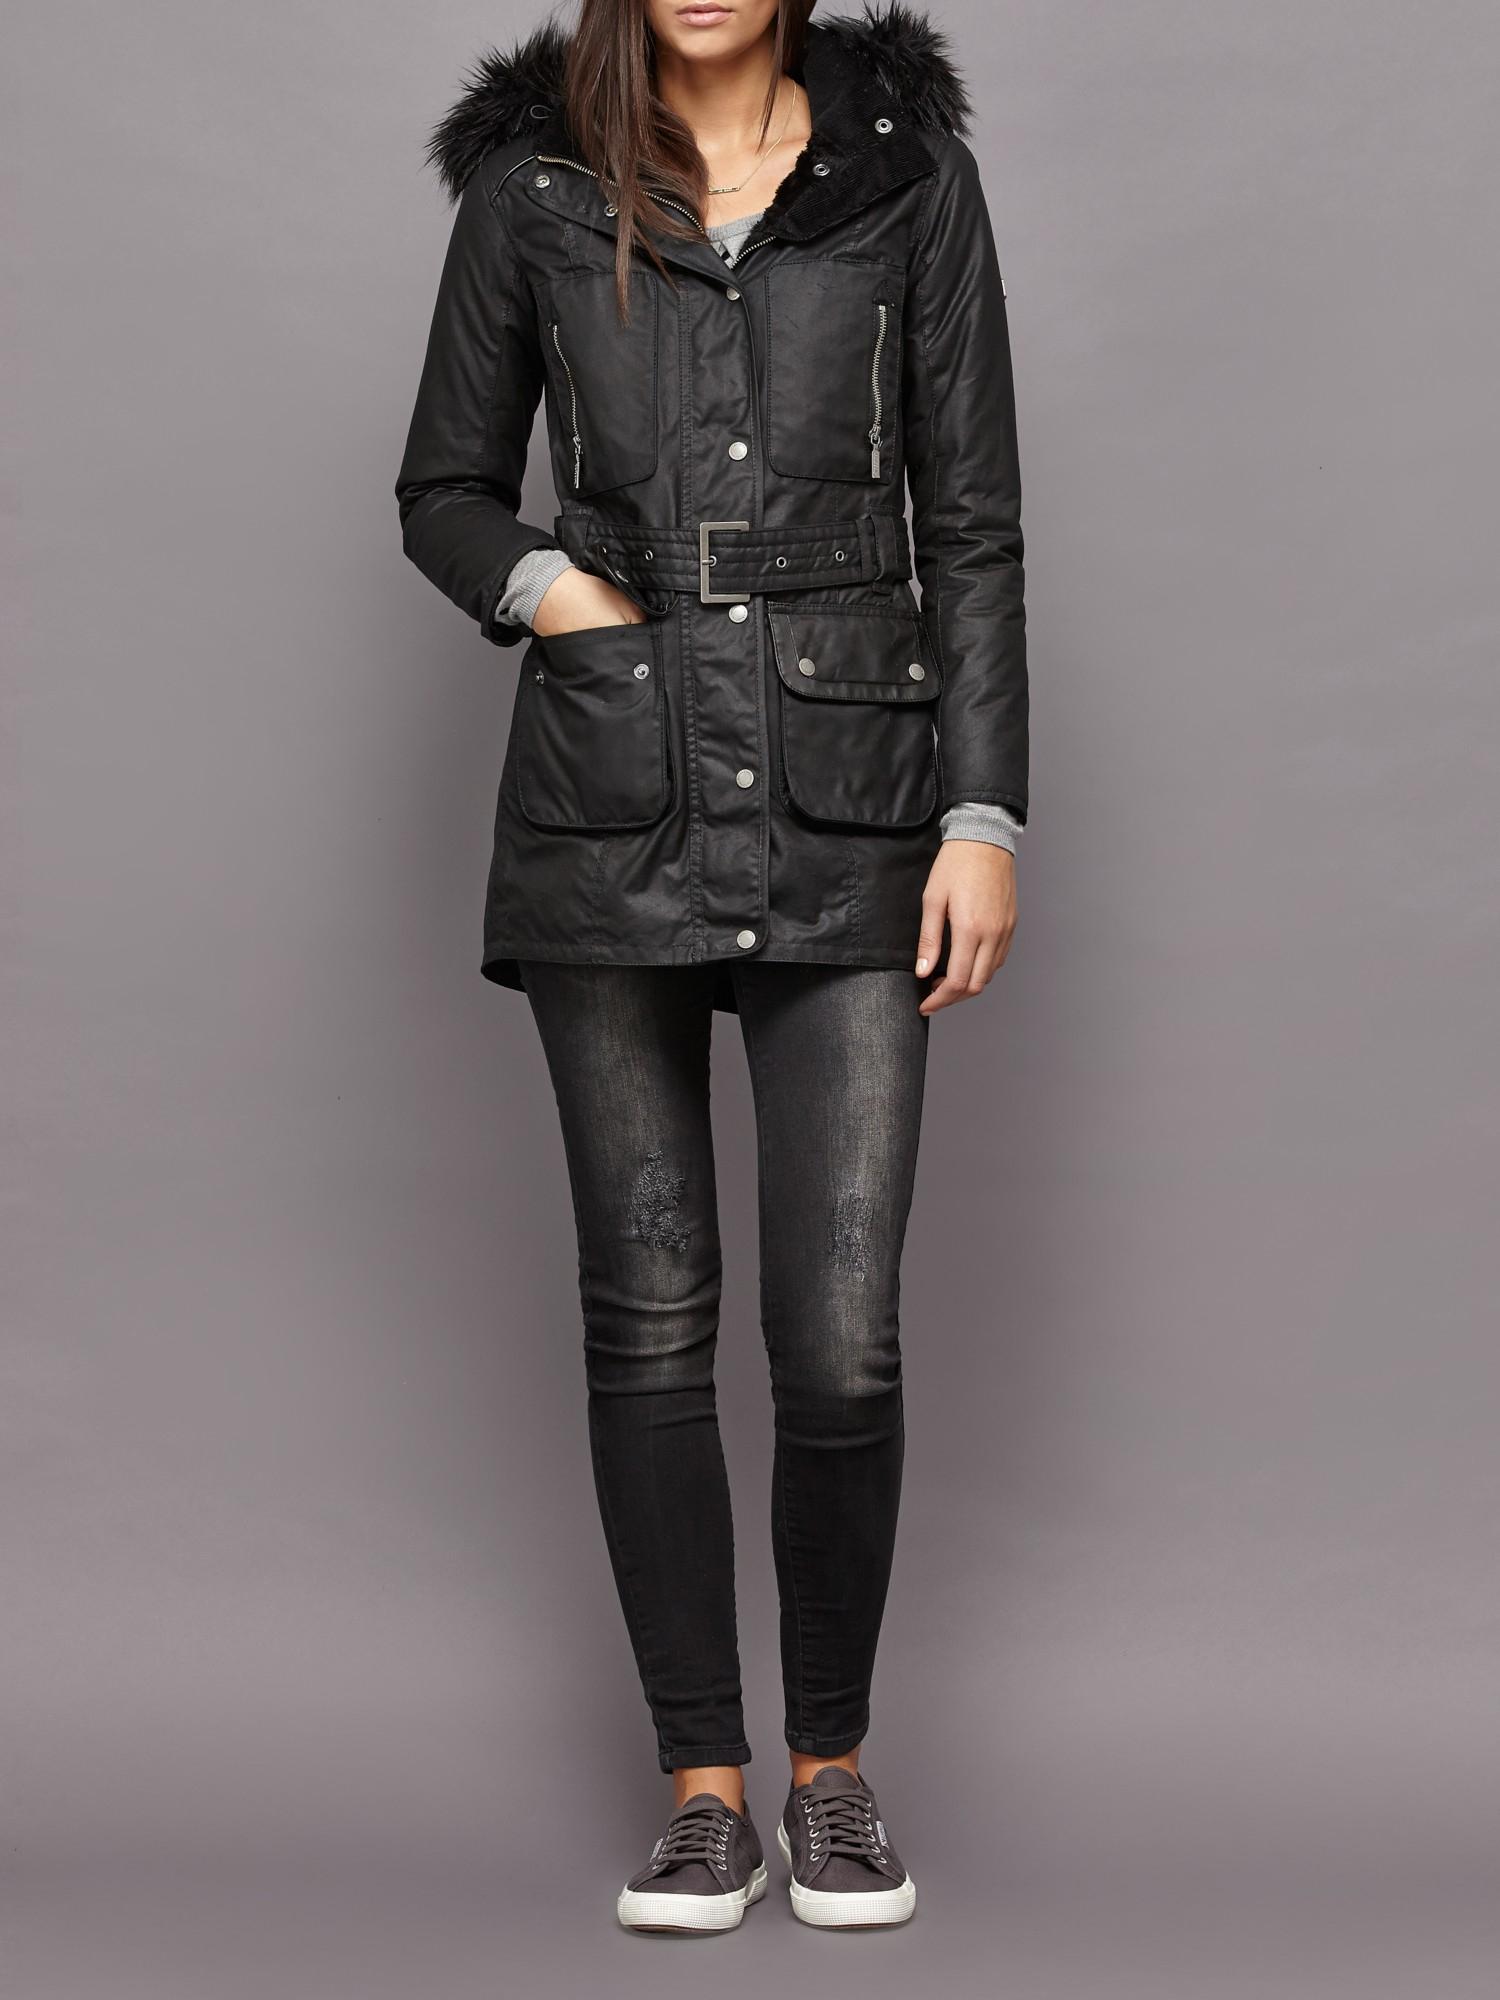 Barbour Katana Wax Parka Jacket in Black | Lyst